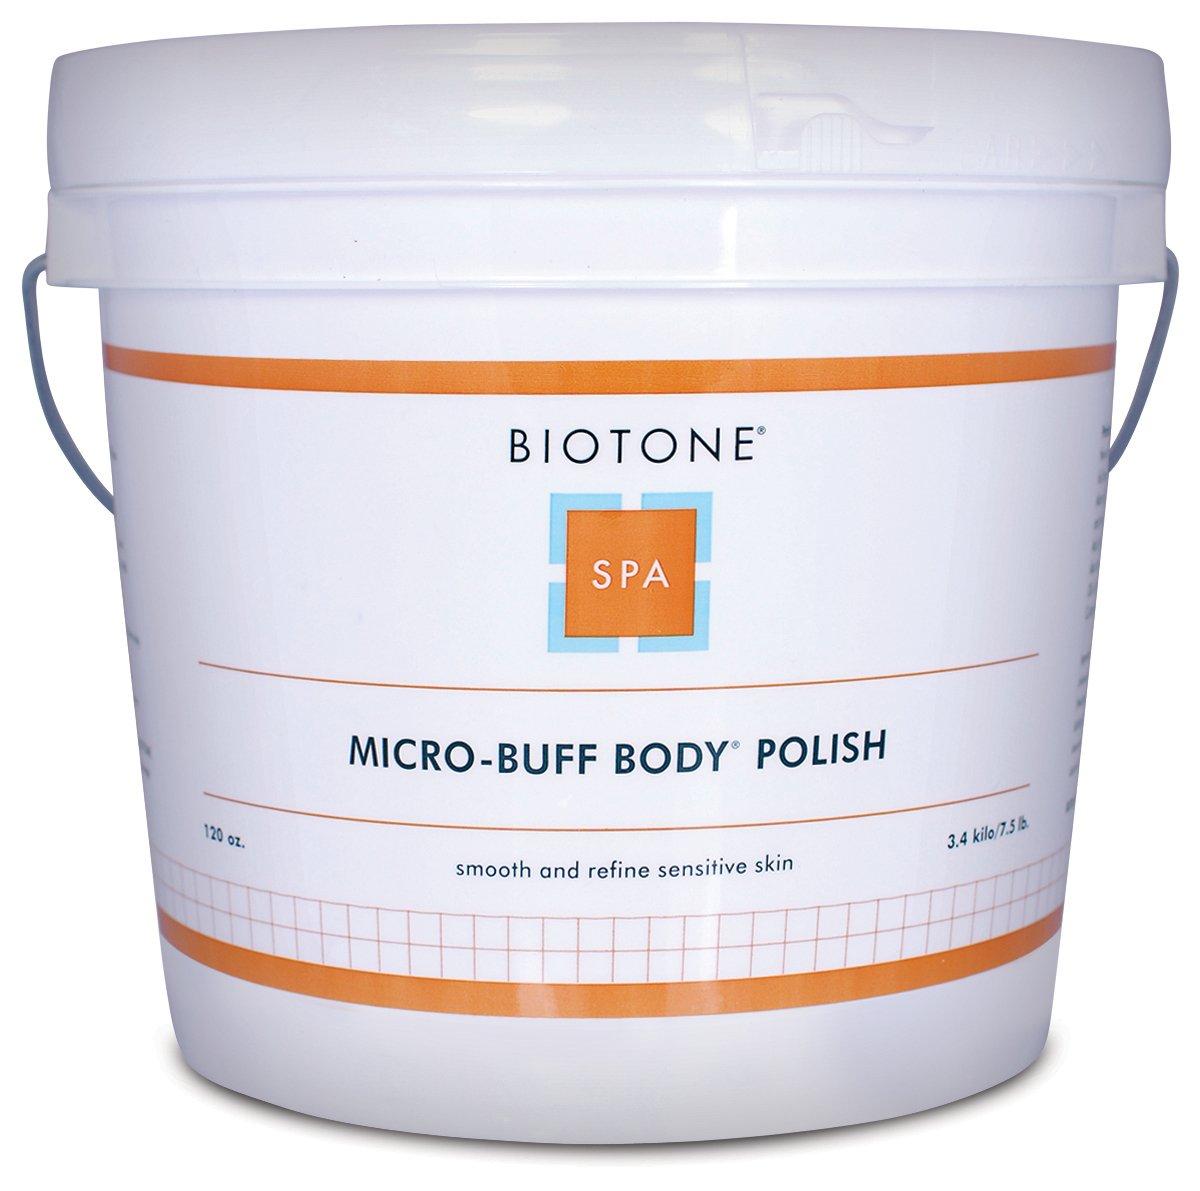 BIOTONE Micro-Buff Body Polish - 120 oz